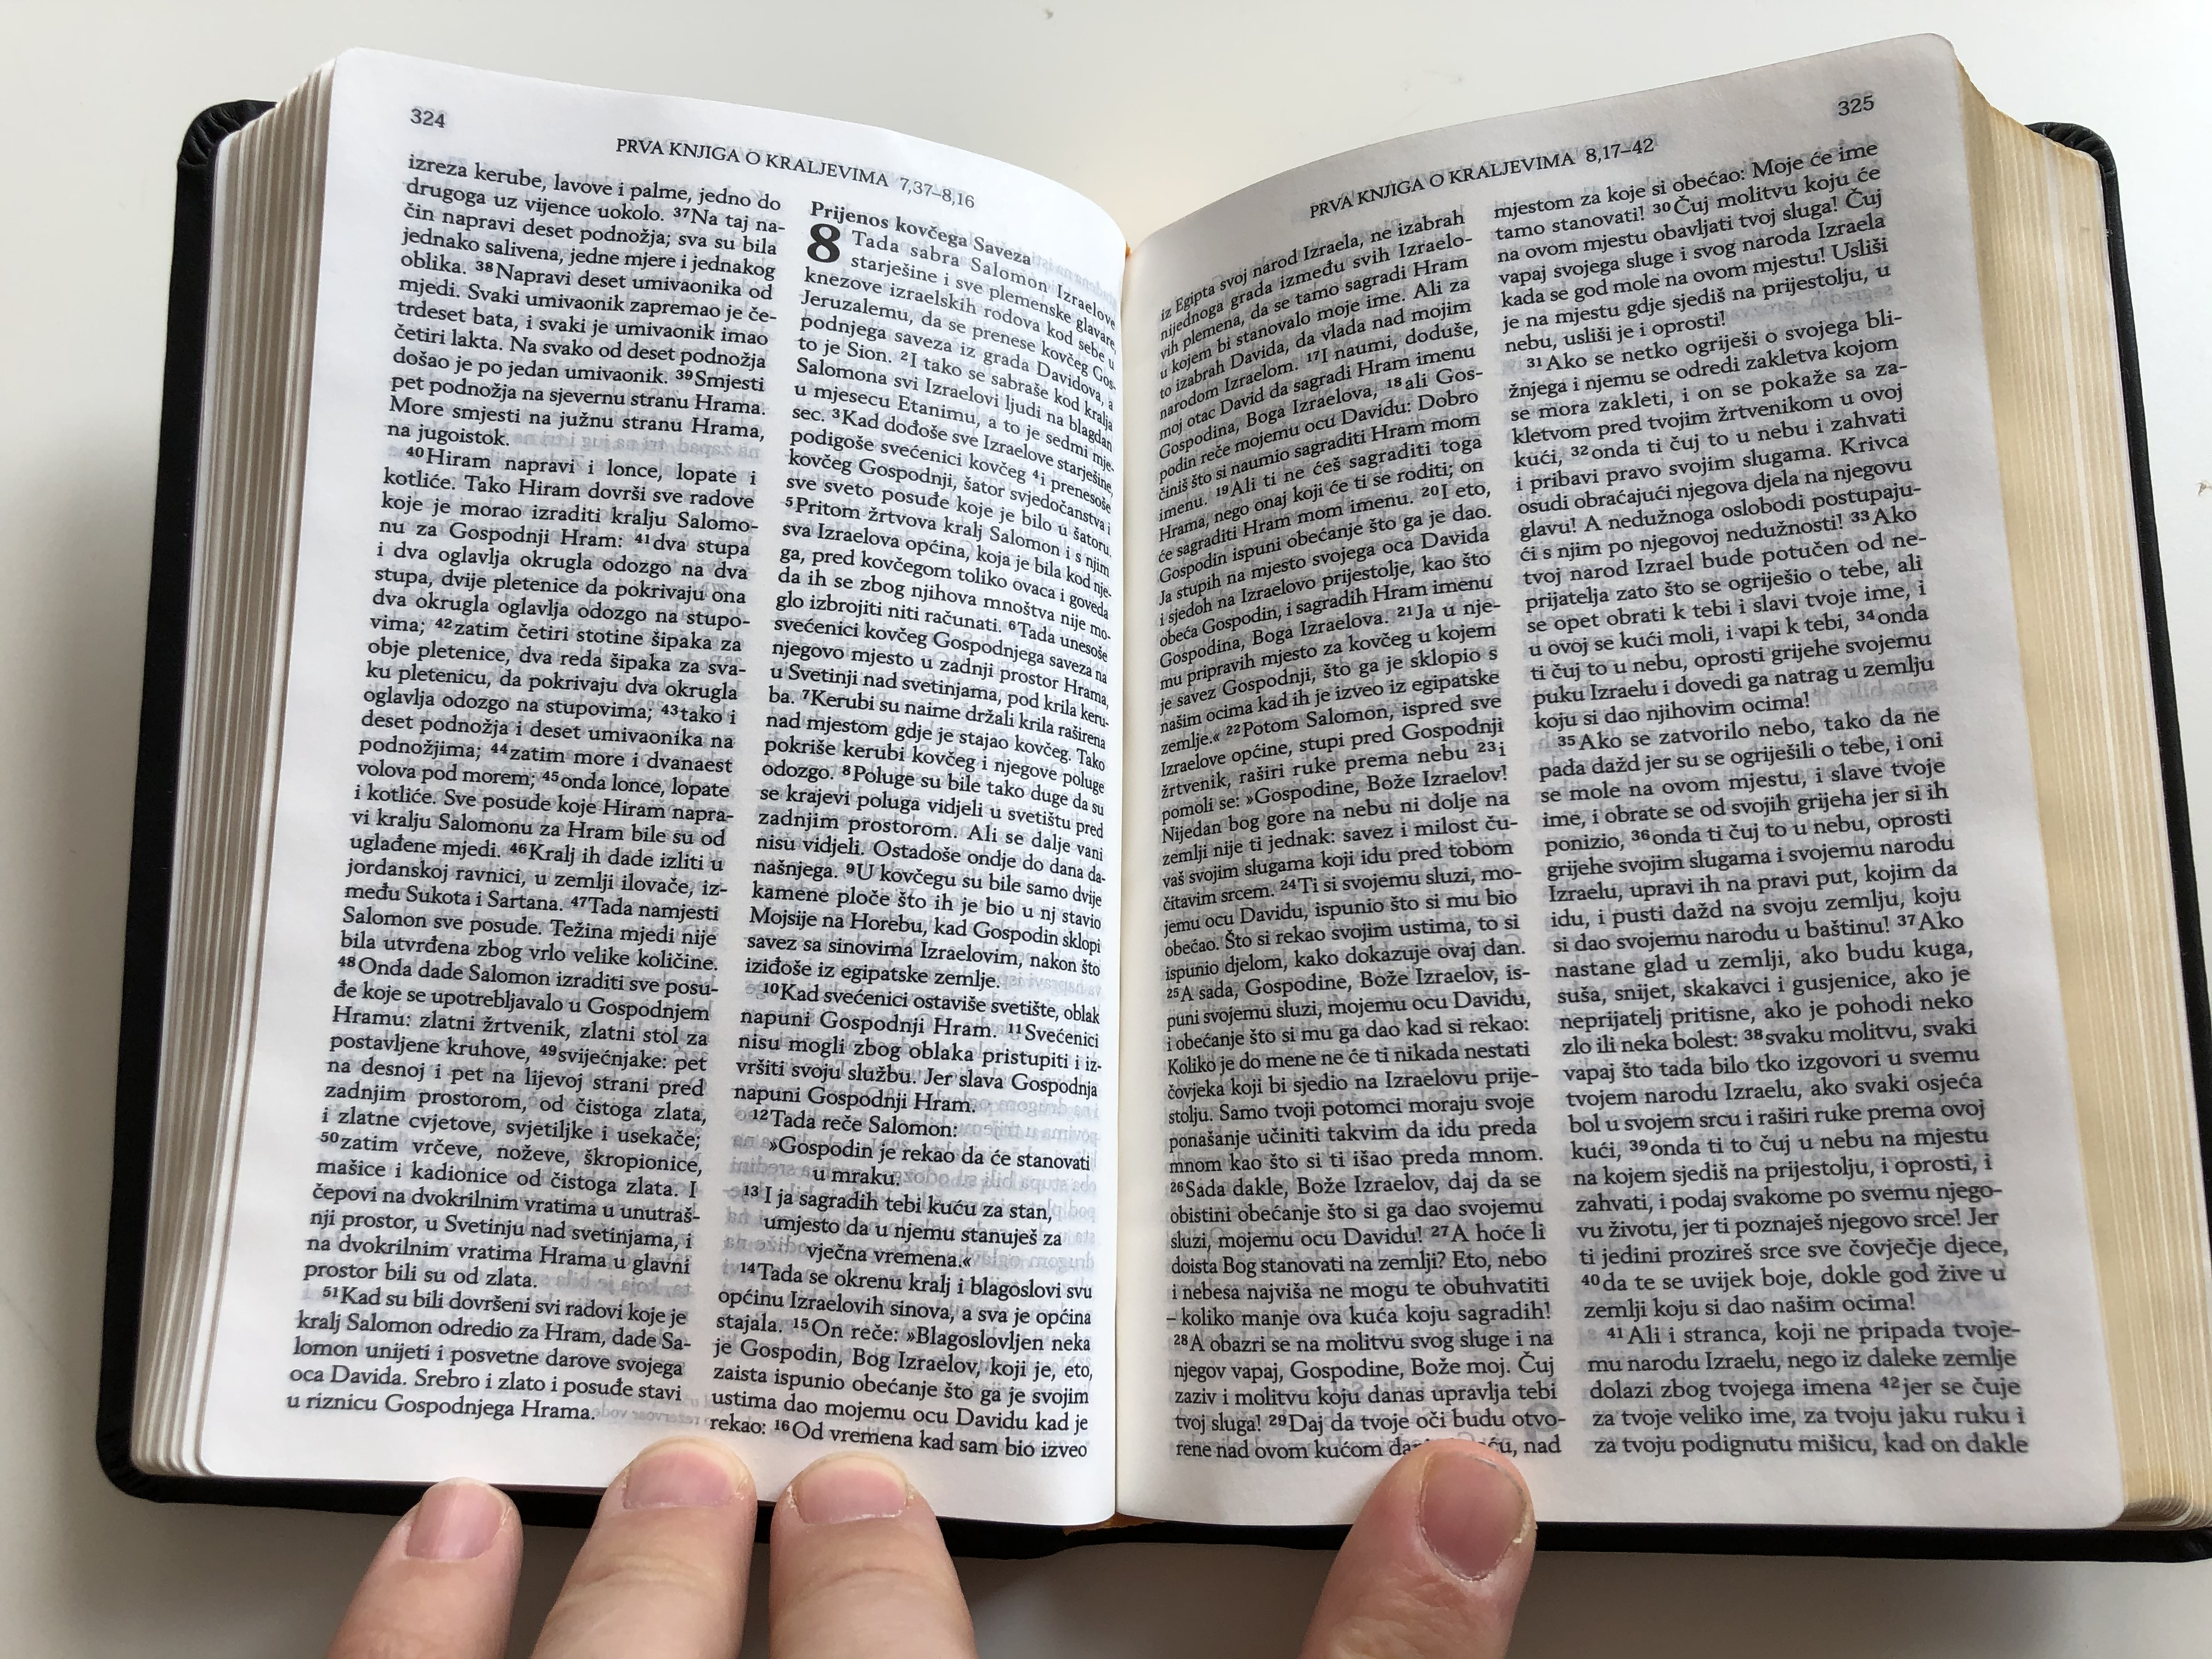 biblija-holy-bible-in-croatian-language-leather-bound-black-golden-edges-8.jpg